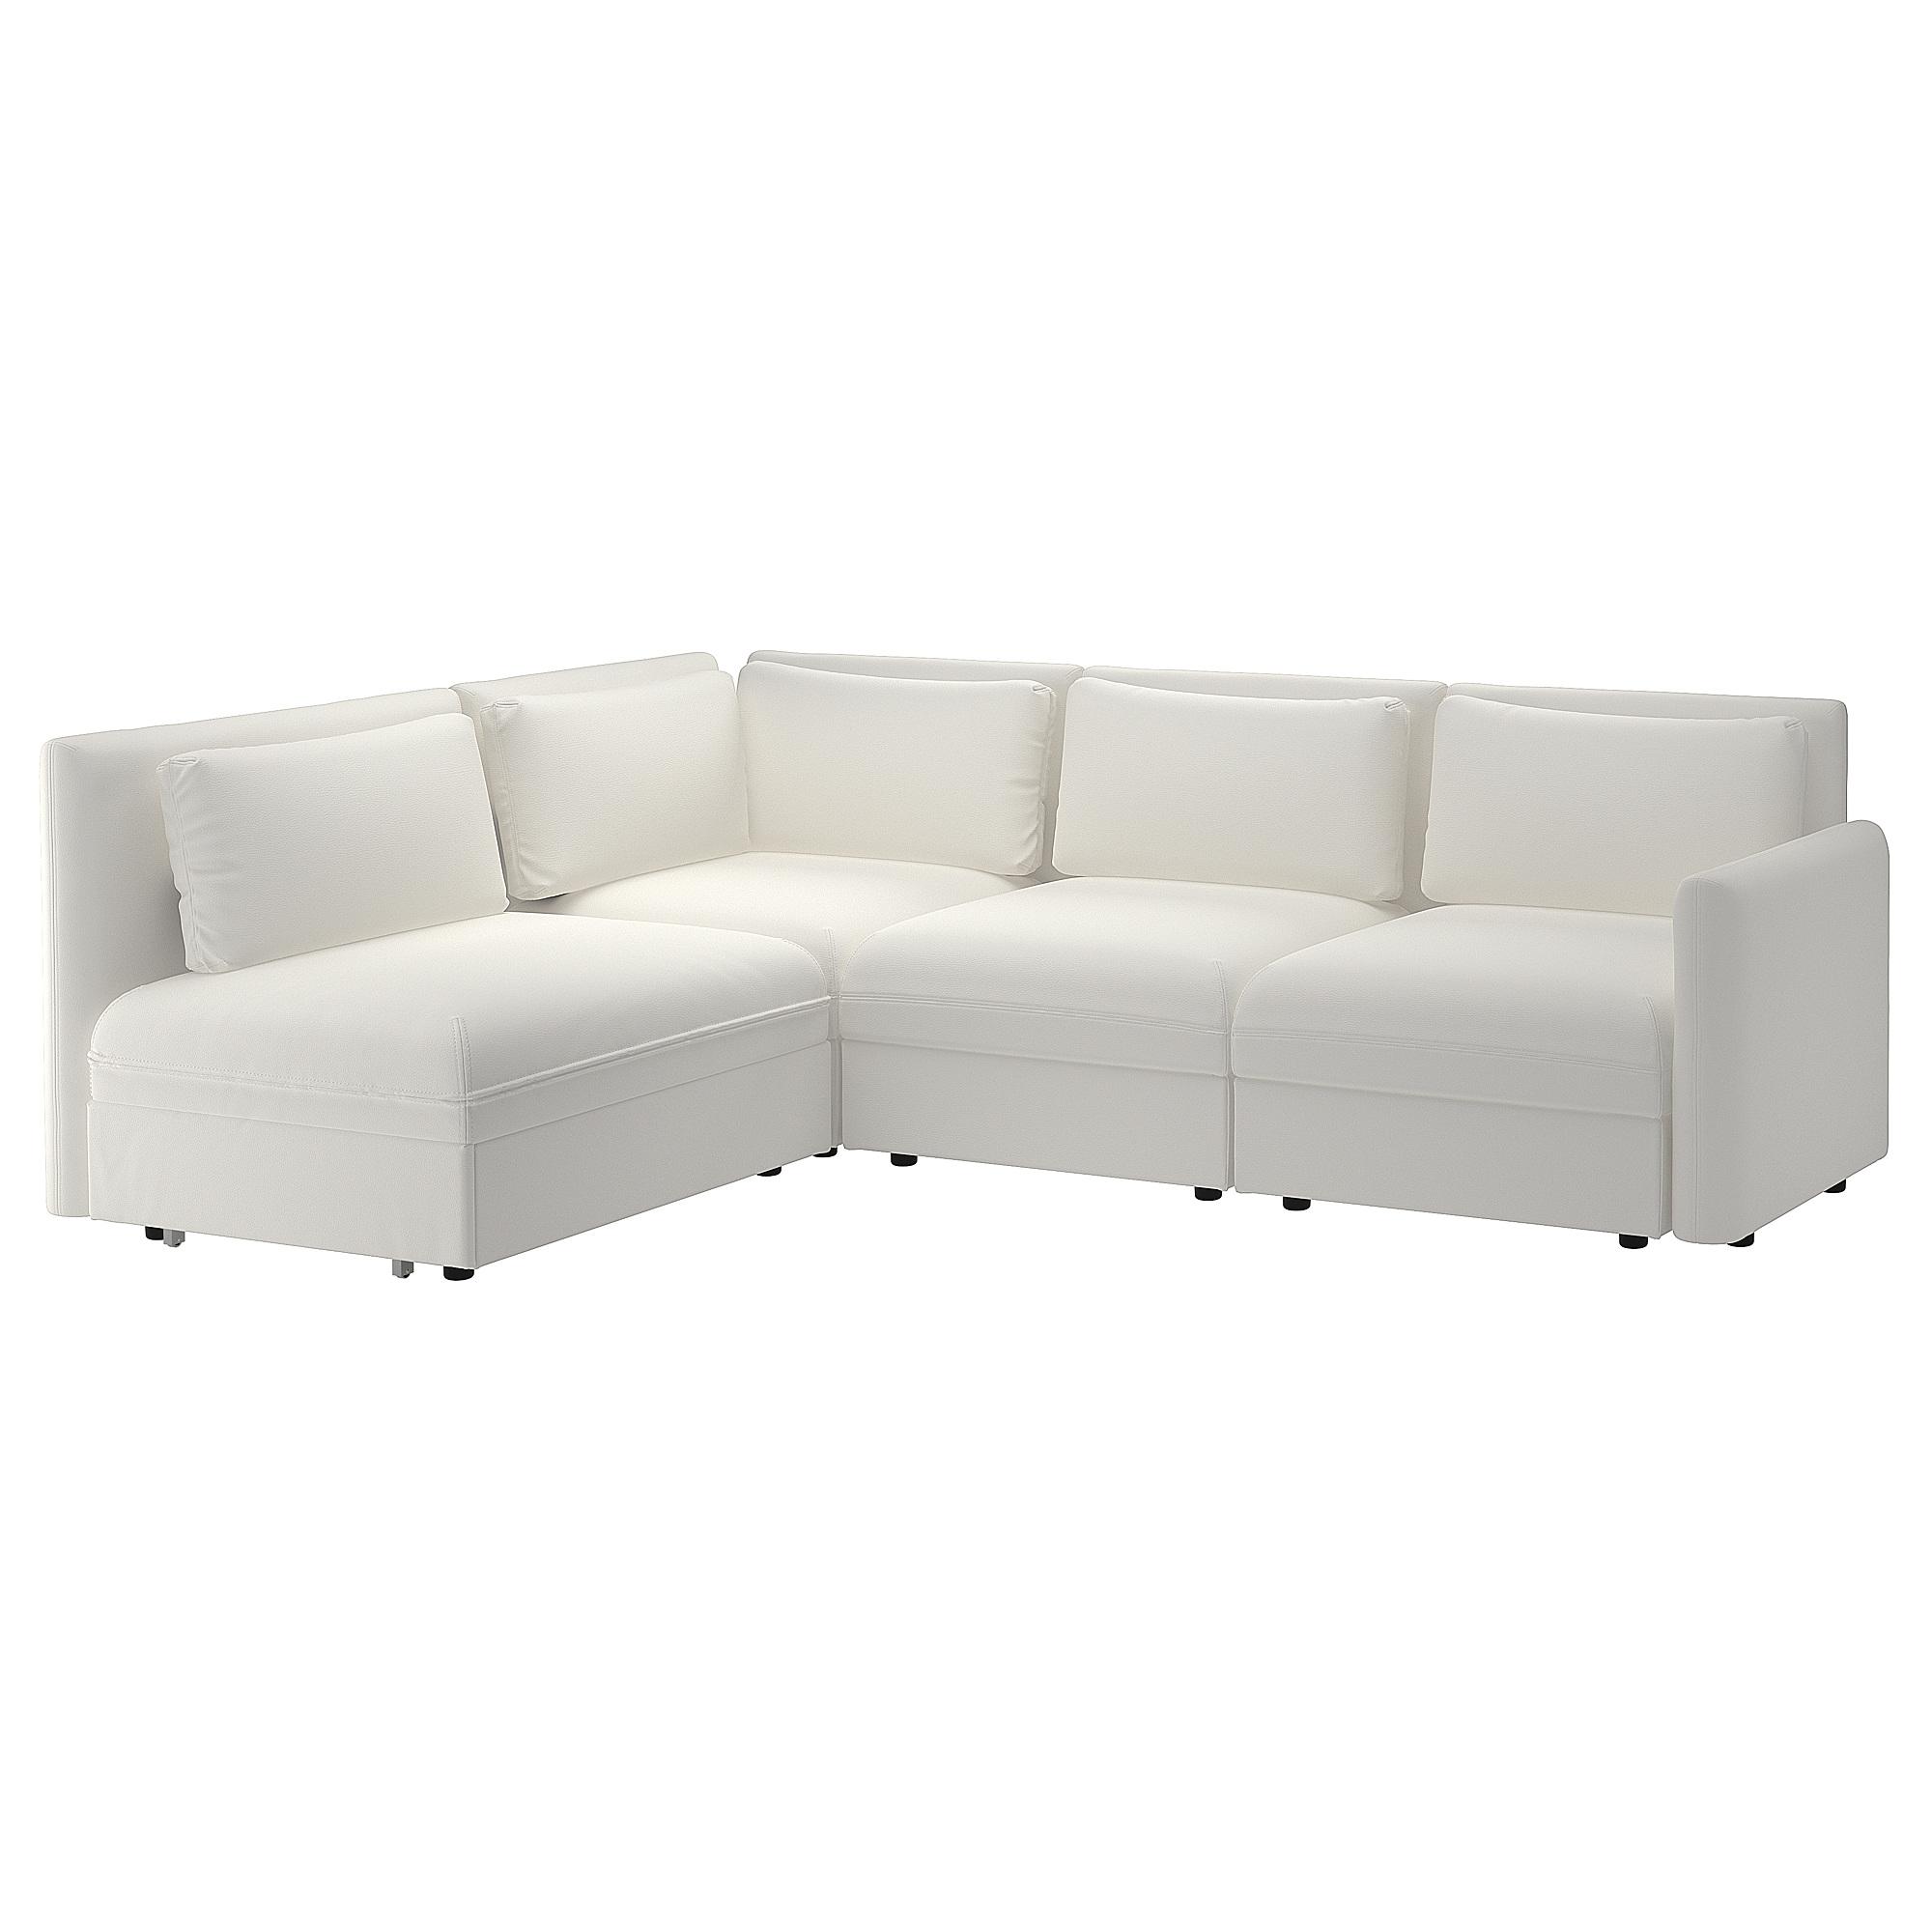 Corner Sofa 3 Seat Bed